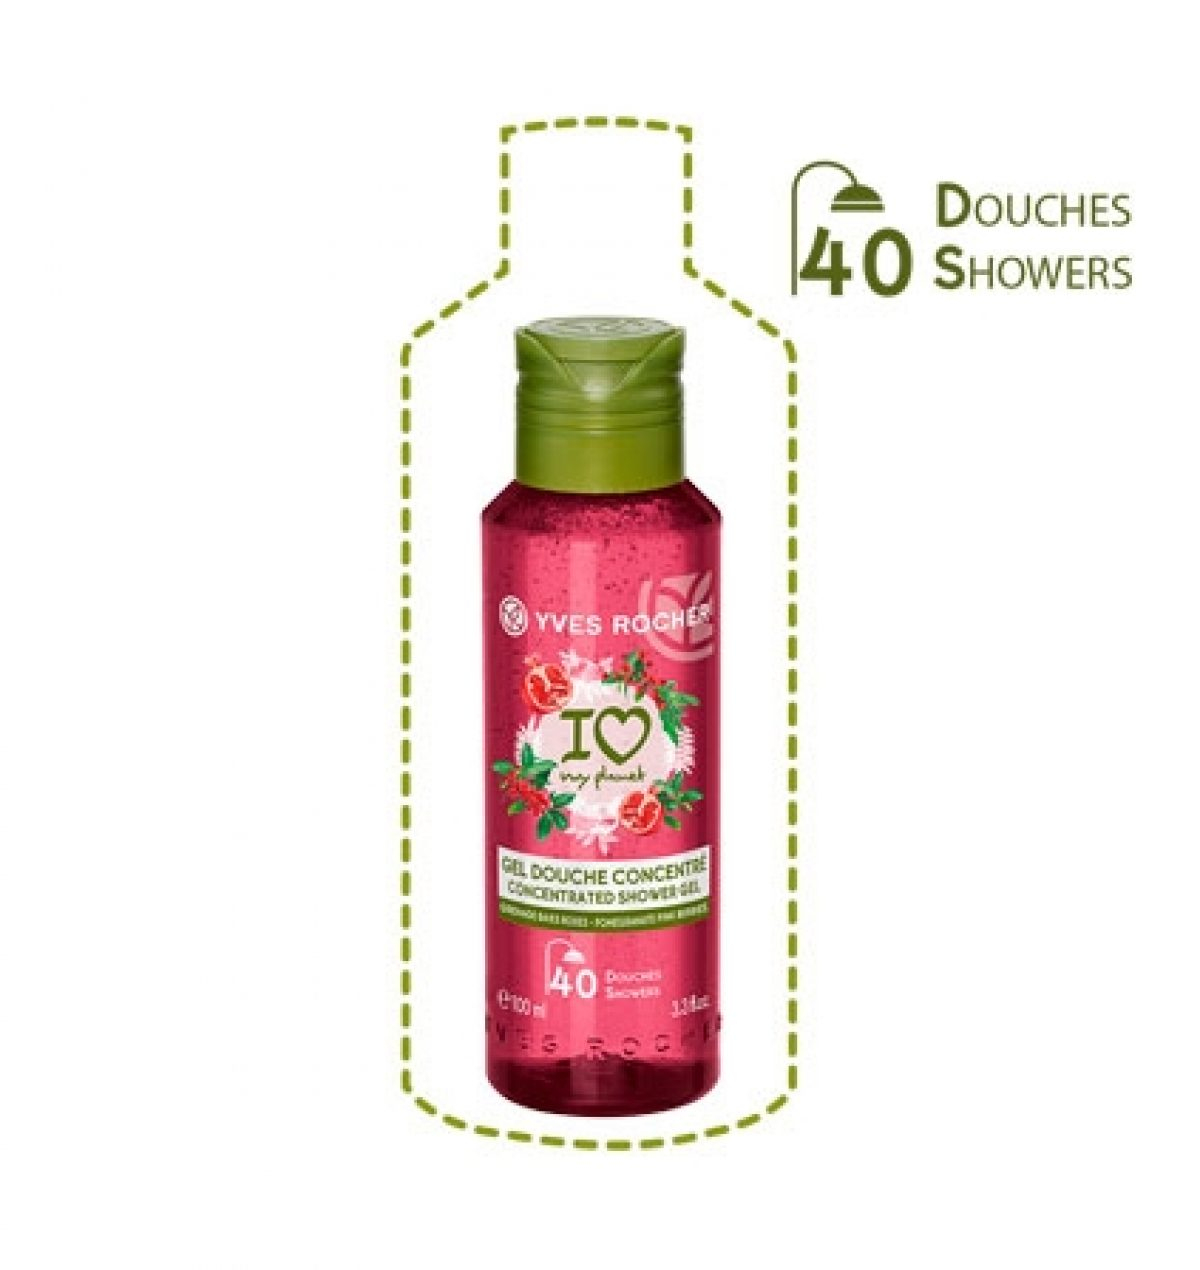 Yves Rocher Gel Douche Concentré Grenade Baies Roses concernant Mini Gel Douche